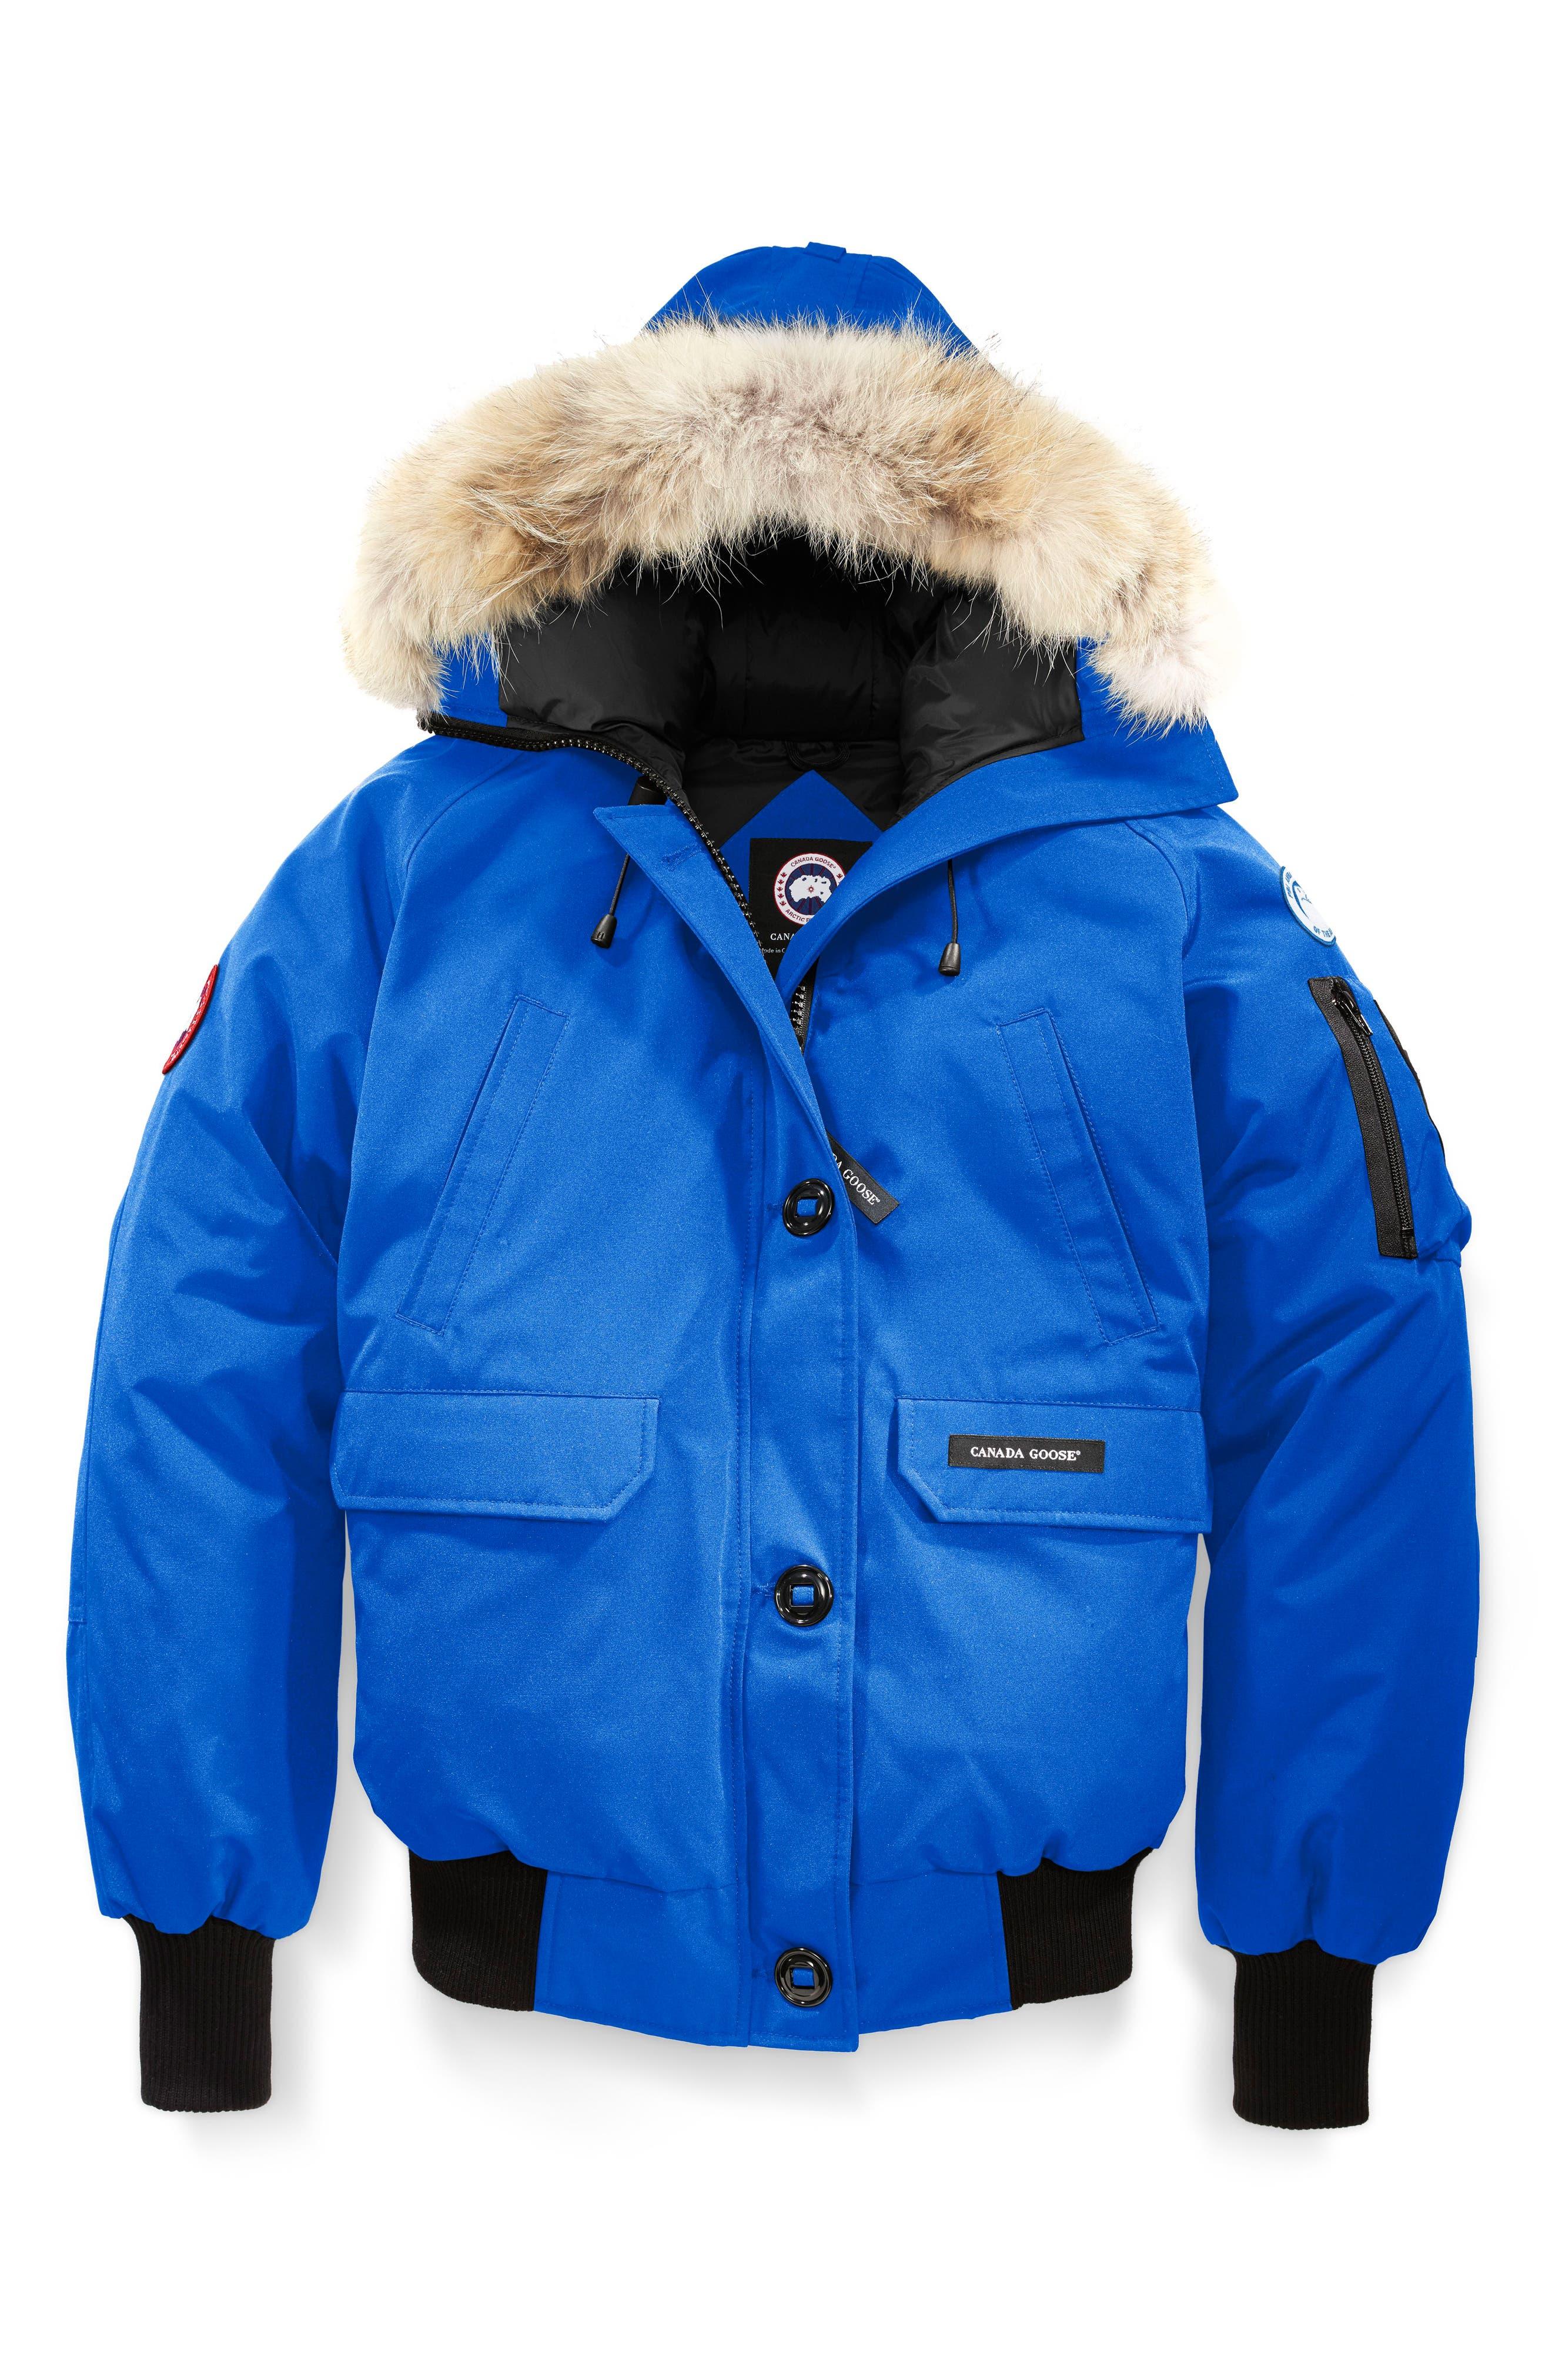 CANADA GOOSE,                             PBI Chilliwack Hooded Down Bomber Jacket with Genuine Coyote Fur Trim,                             Alternate thumbnail 4, color,                             ROYAL PBI BLUE